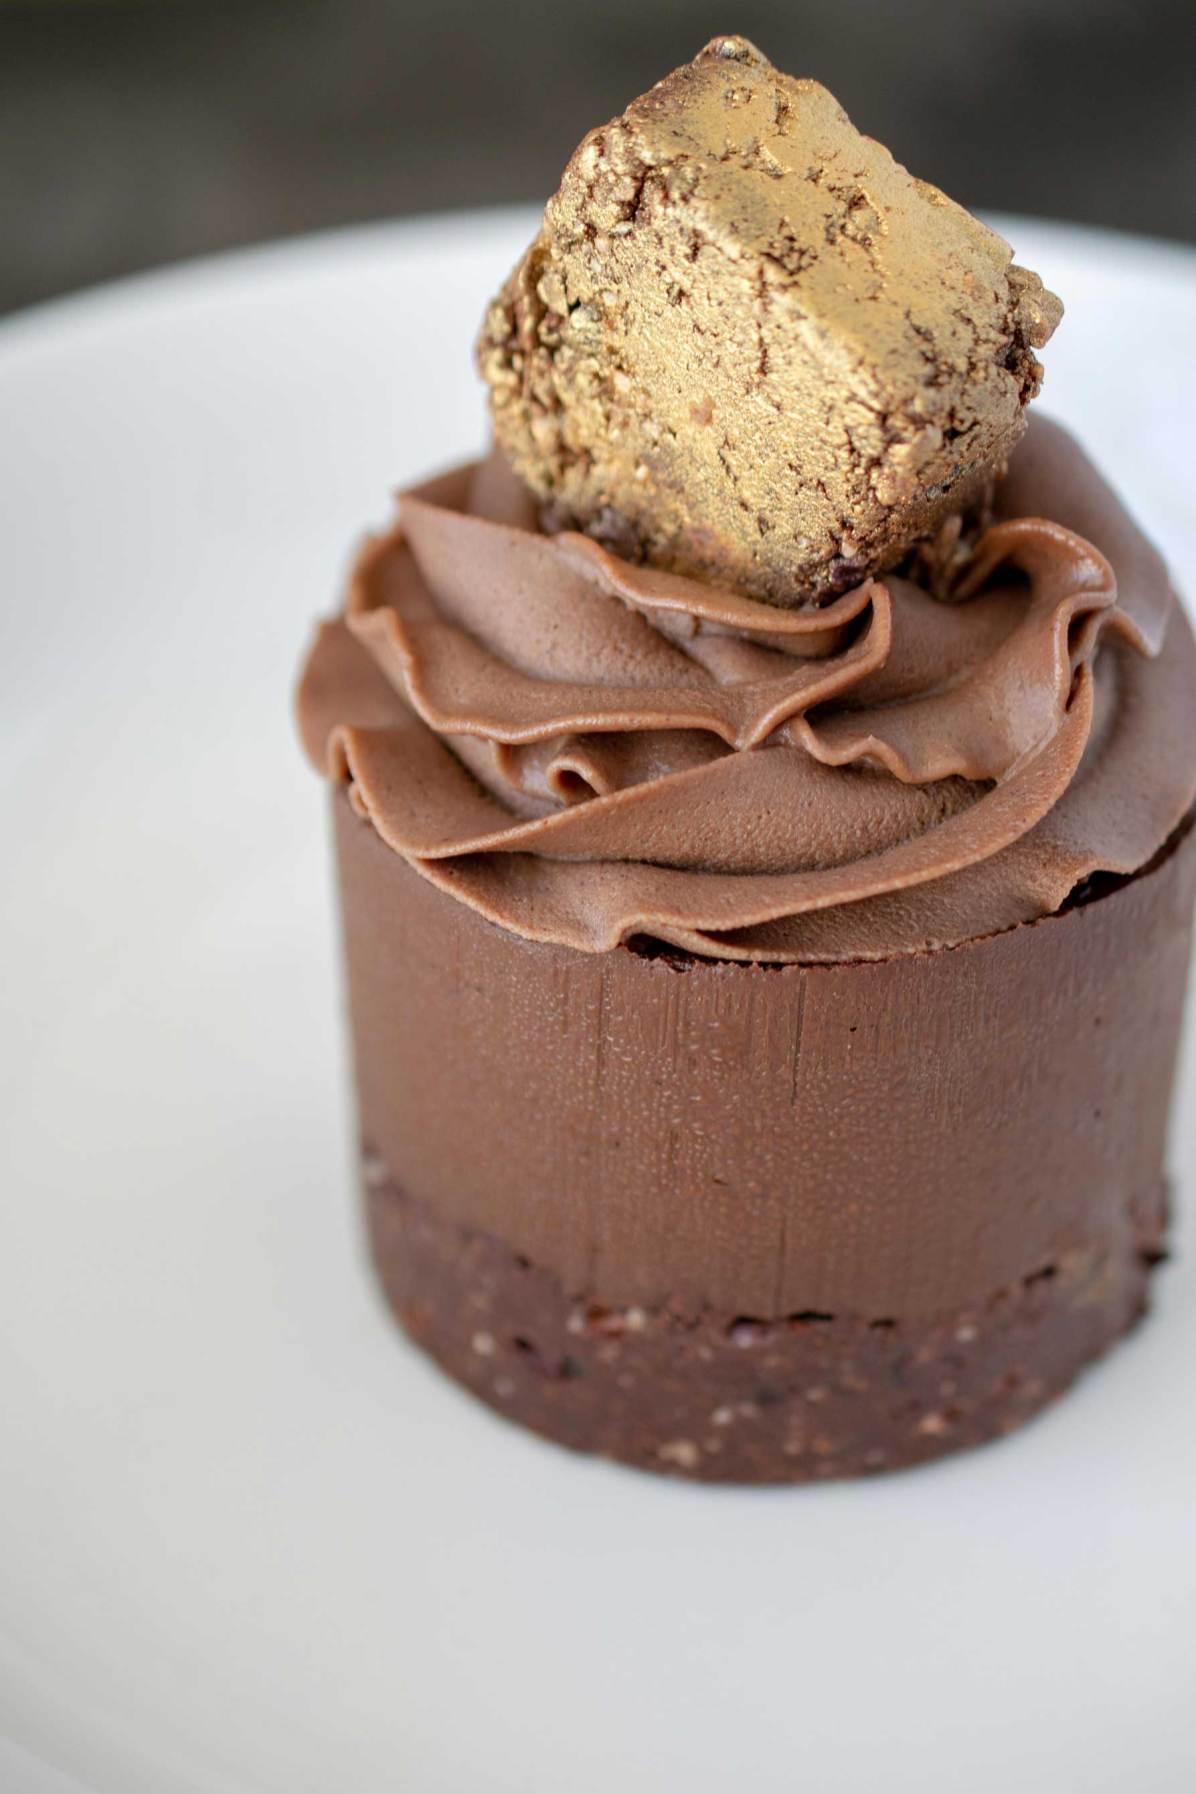 Vegan Double Chocolate Fudge Cake